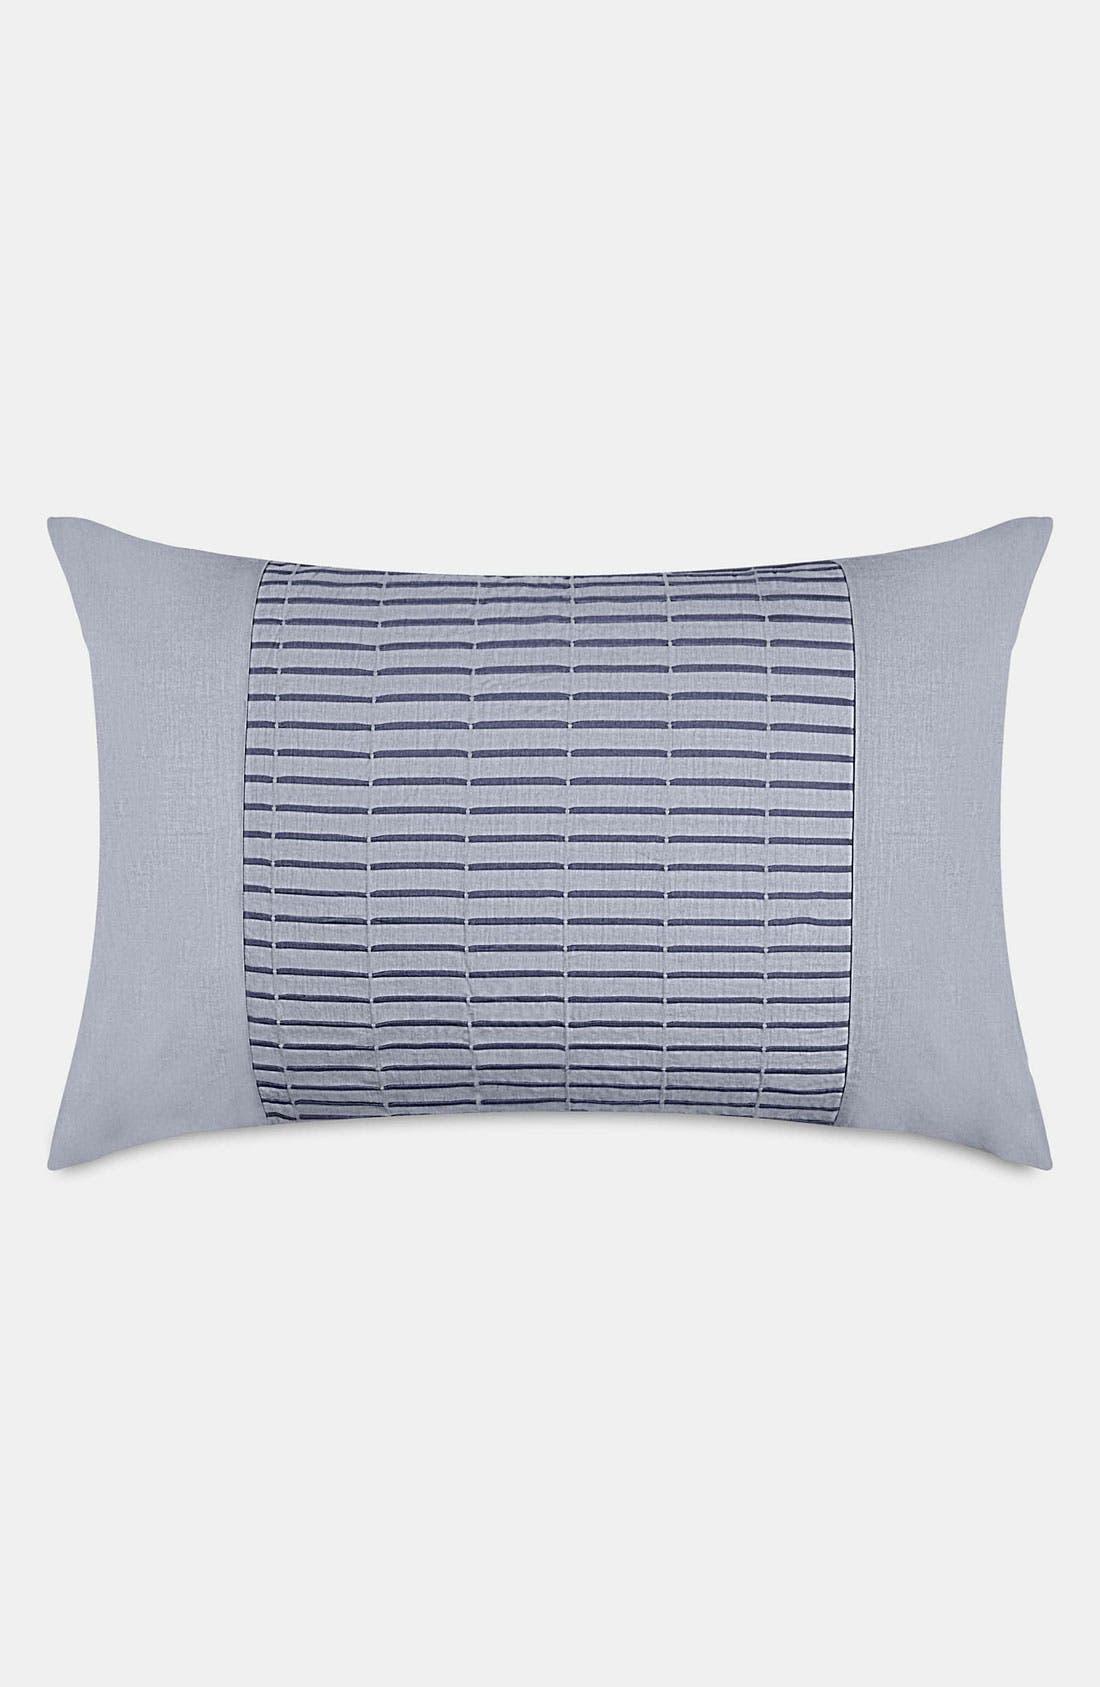 Alternate Image 1 Selected - DKNY 'City Rhythm' Pillow Sham